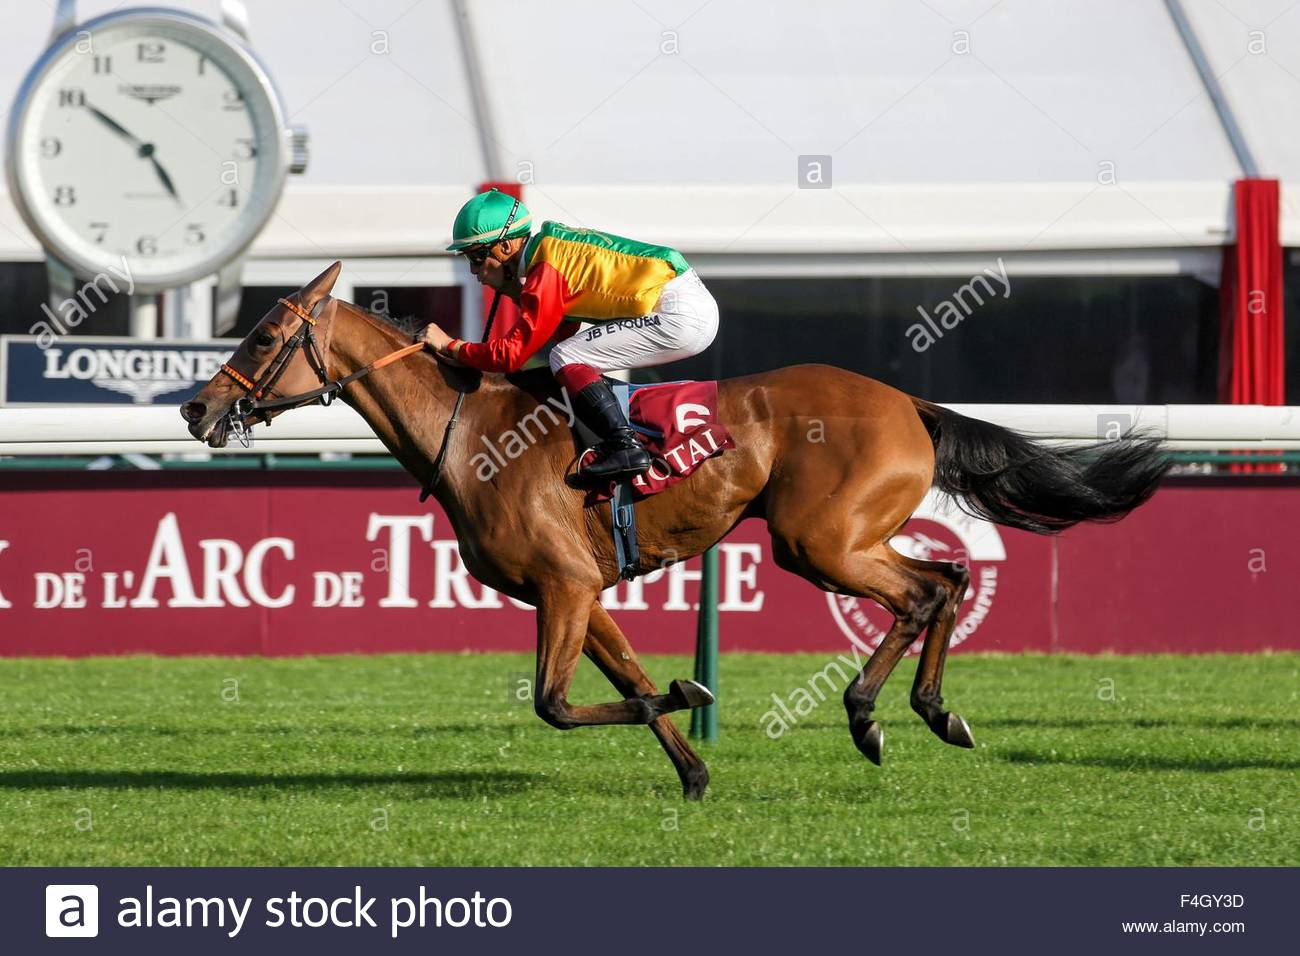 Paris, France. October 3rd, 2015. FRANCE, Paris: A jockey gets on a horse during 94th Prix de l'Arc de Triomphe Stock Photo